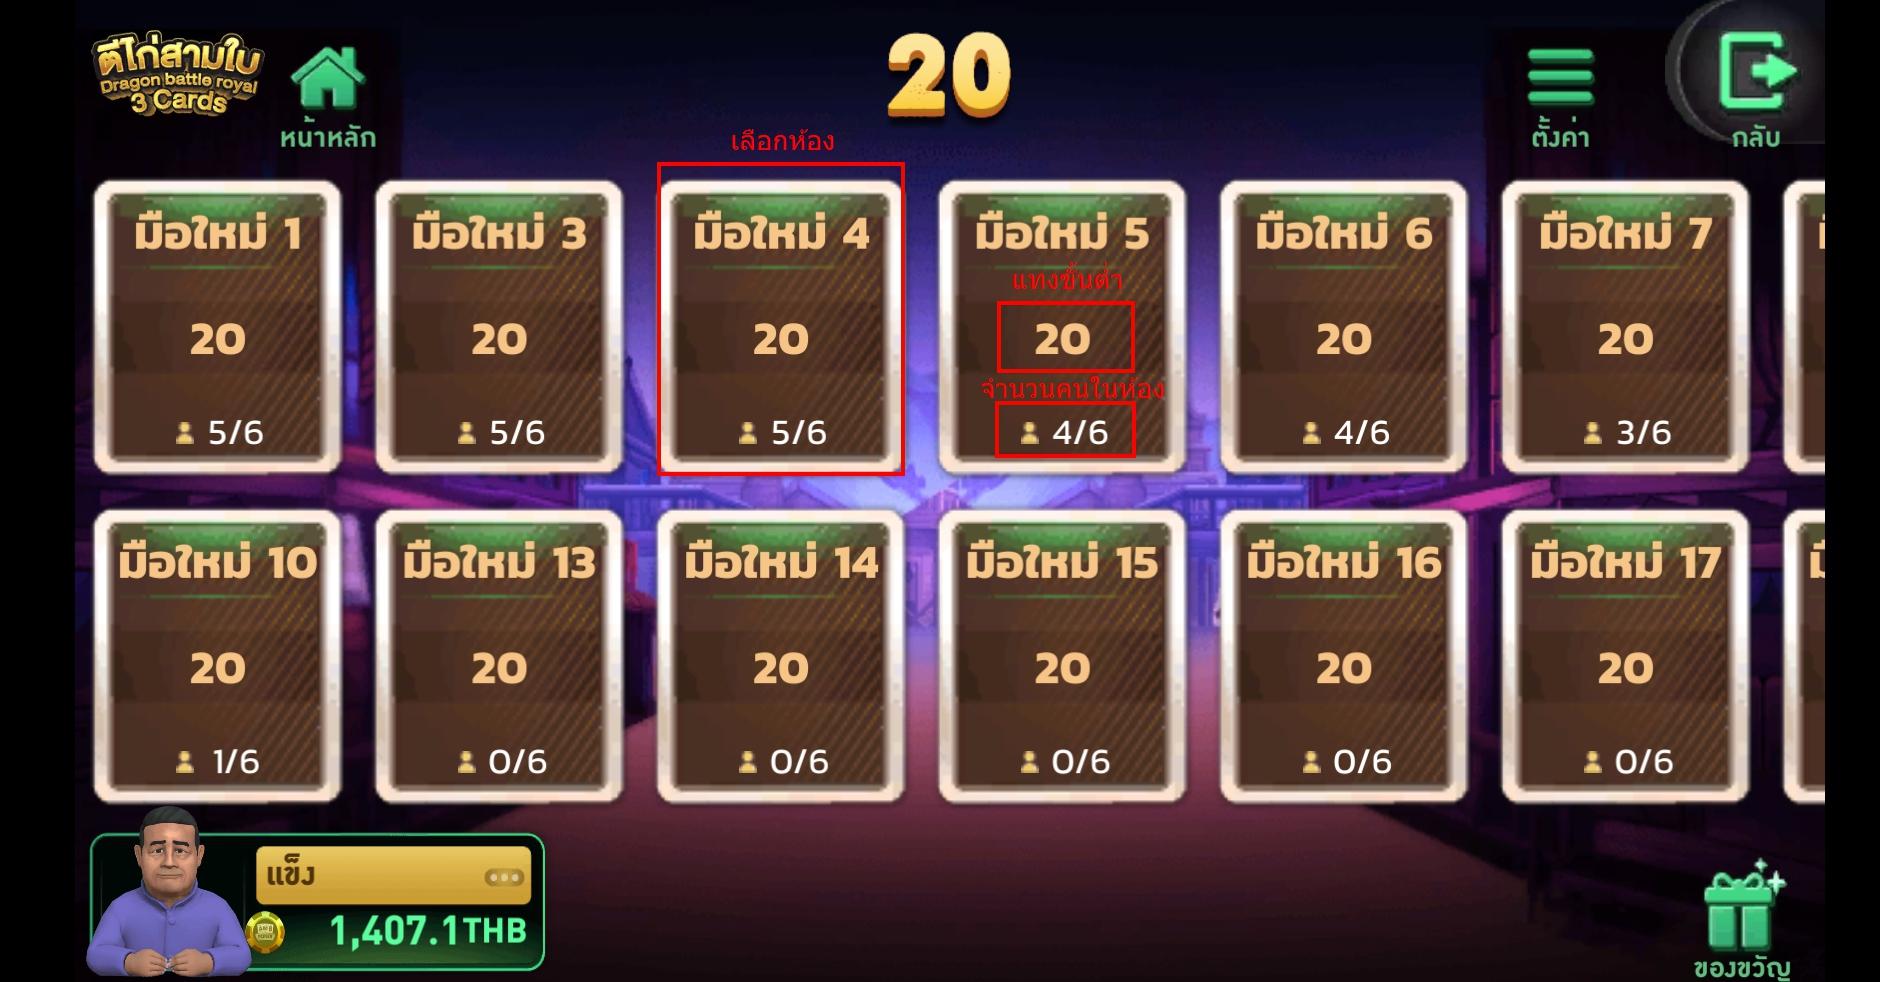 play game dragon battle royal 3 cards4